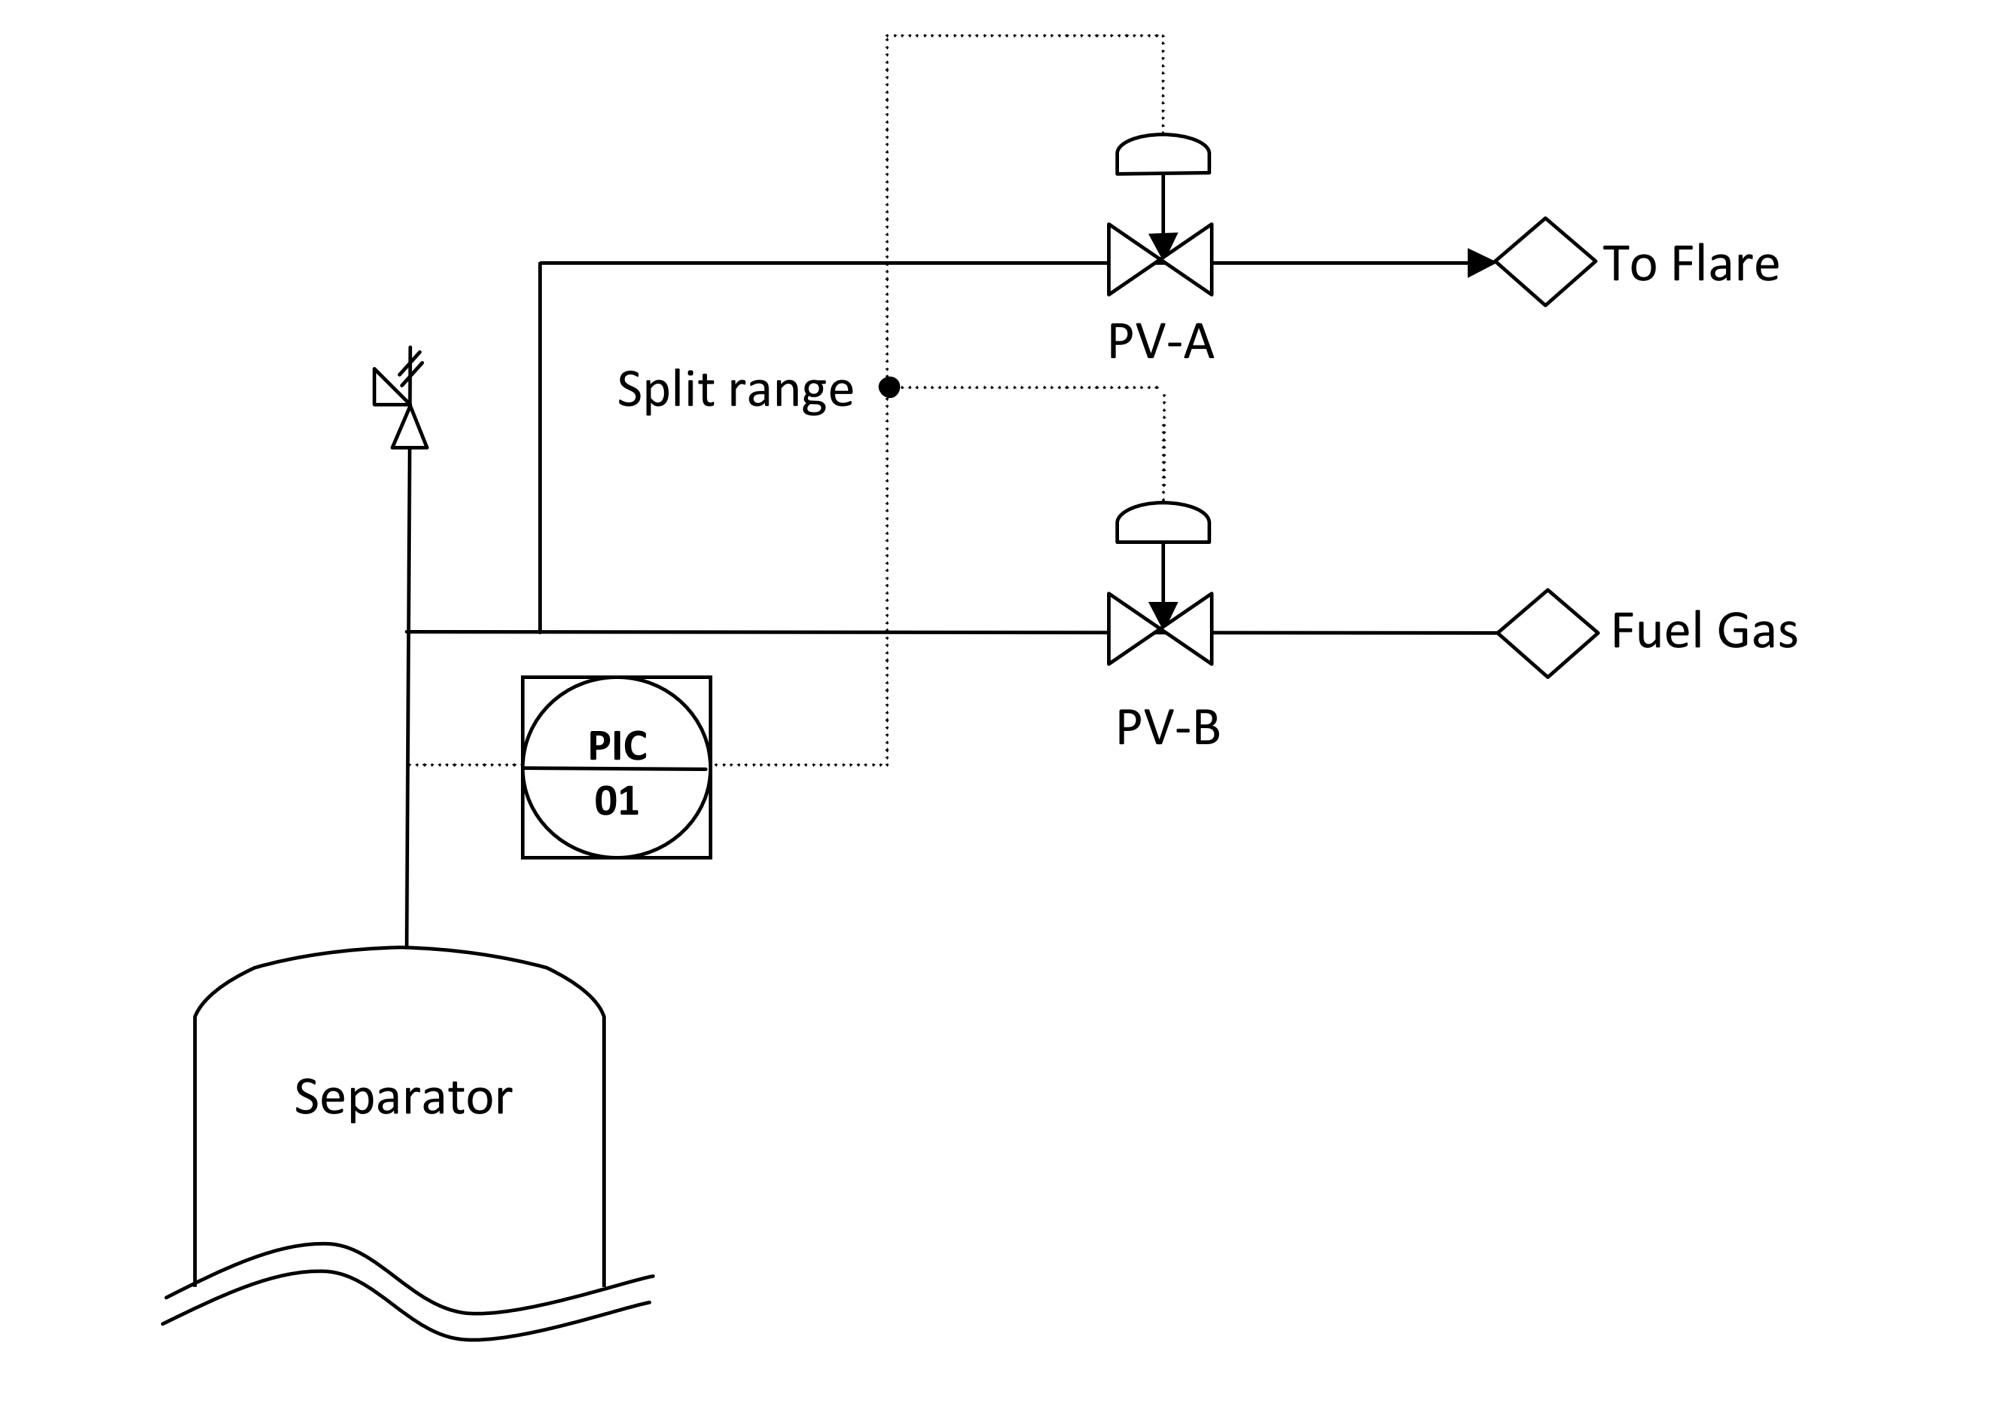 hight resolution of split range control loop